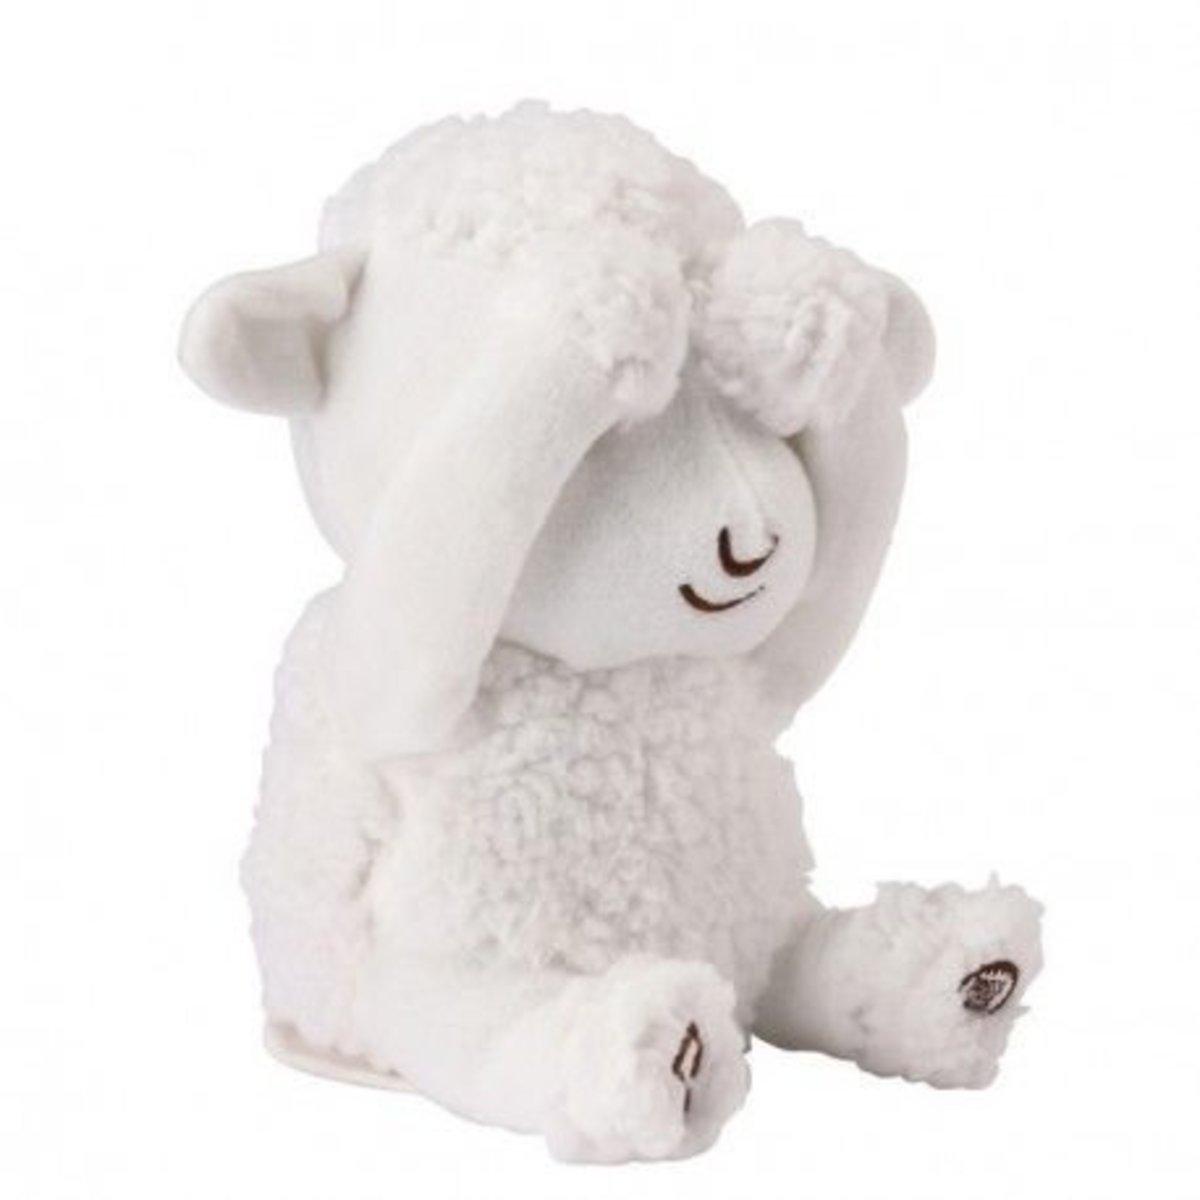 PEEK-A-BOO The Sheep